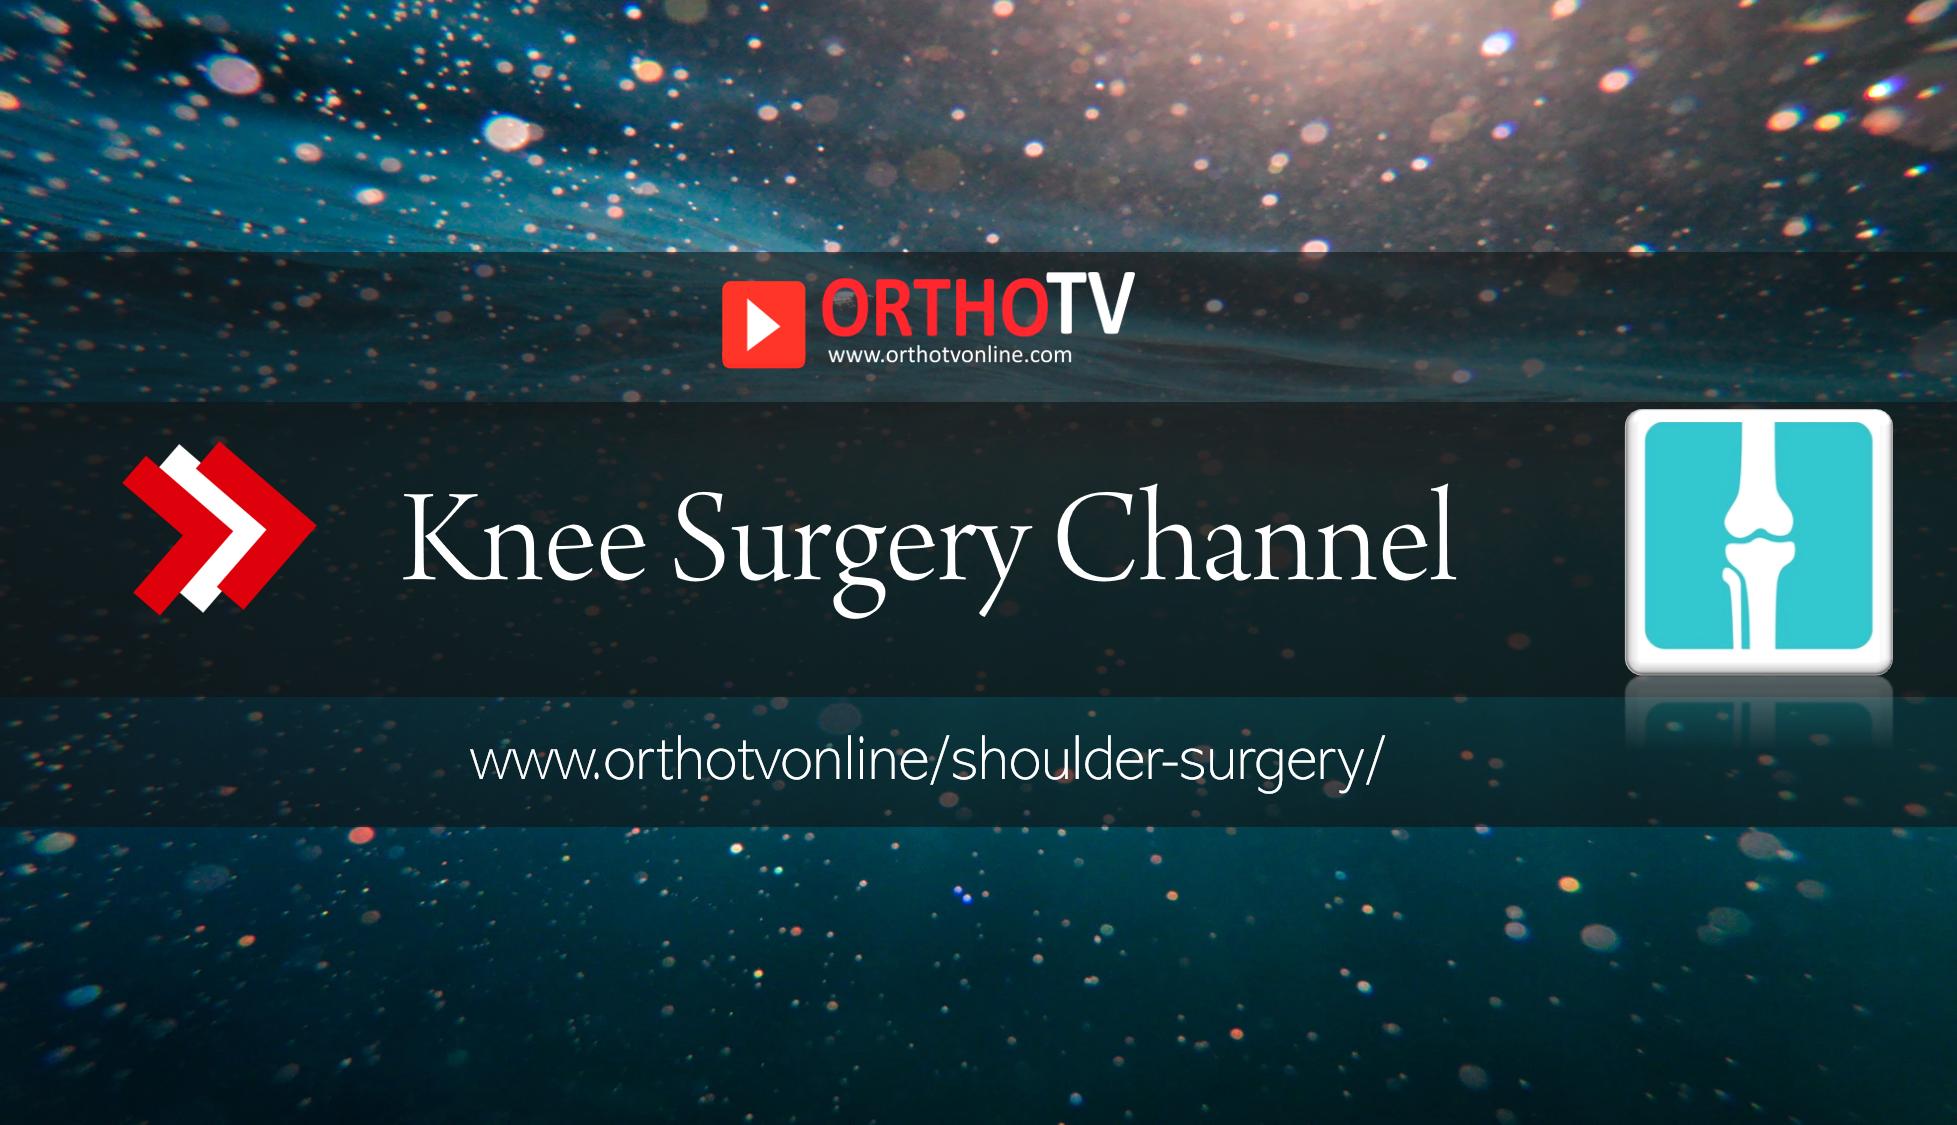 - OrthoTV Knee Surgery Channel - Knee Surgery